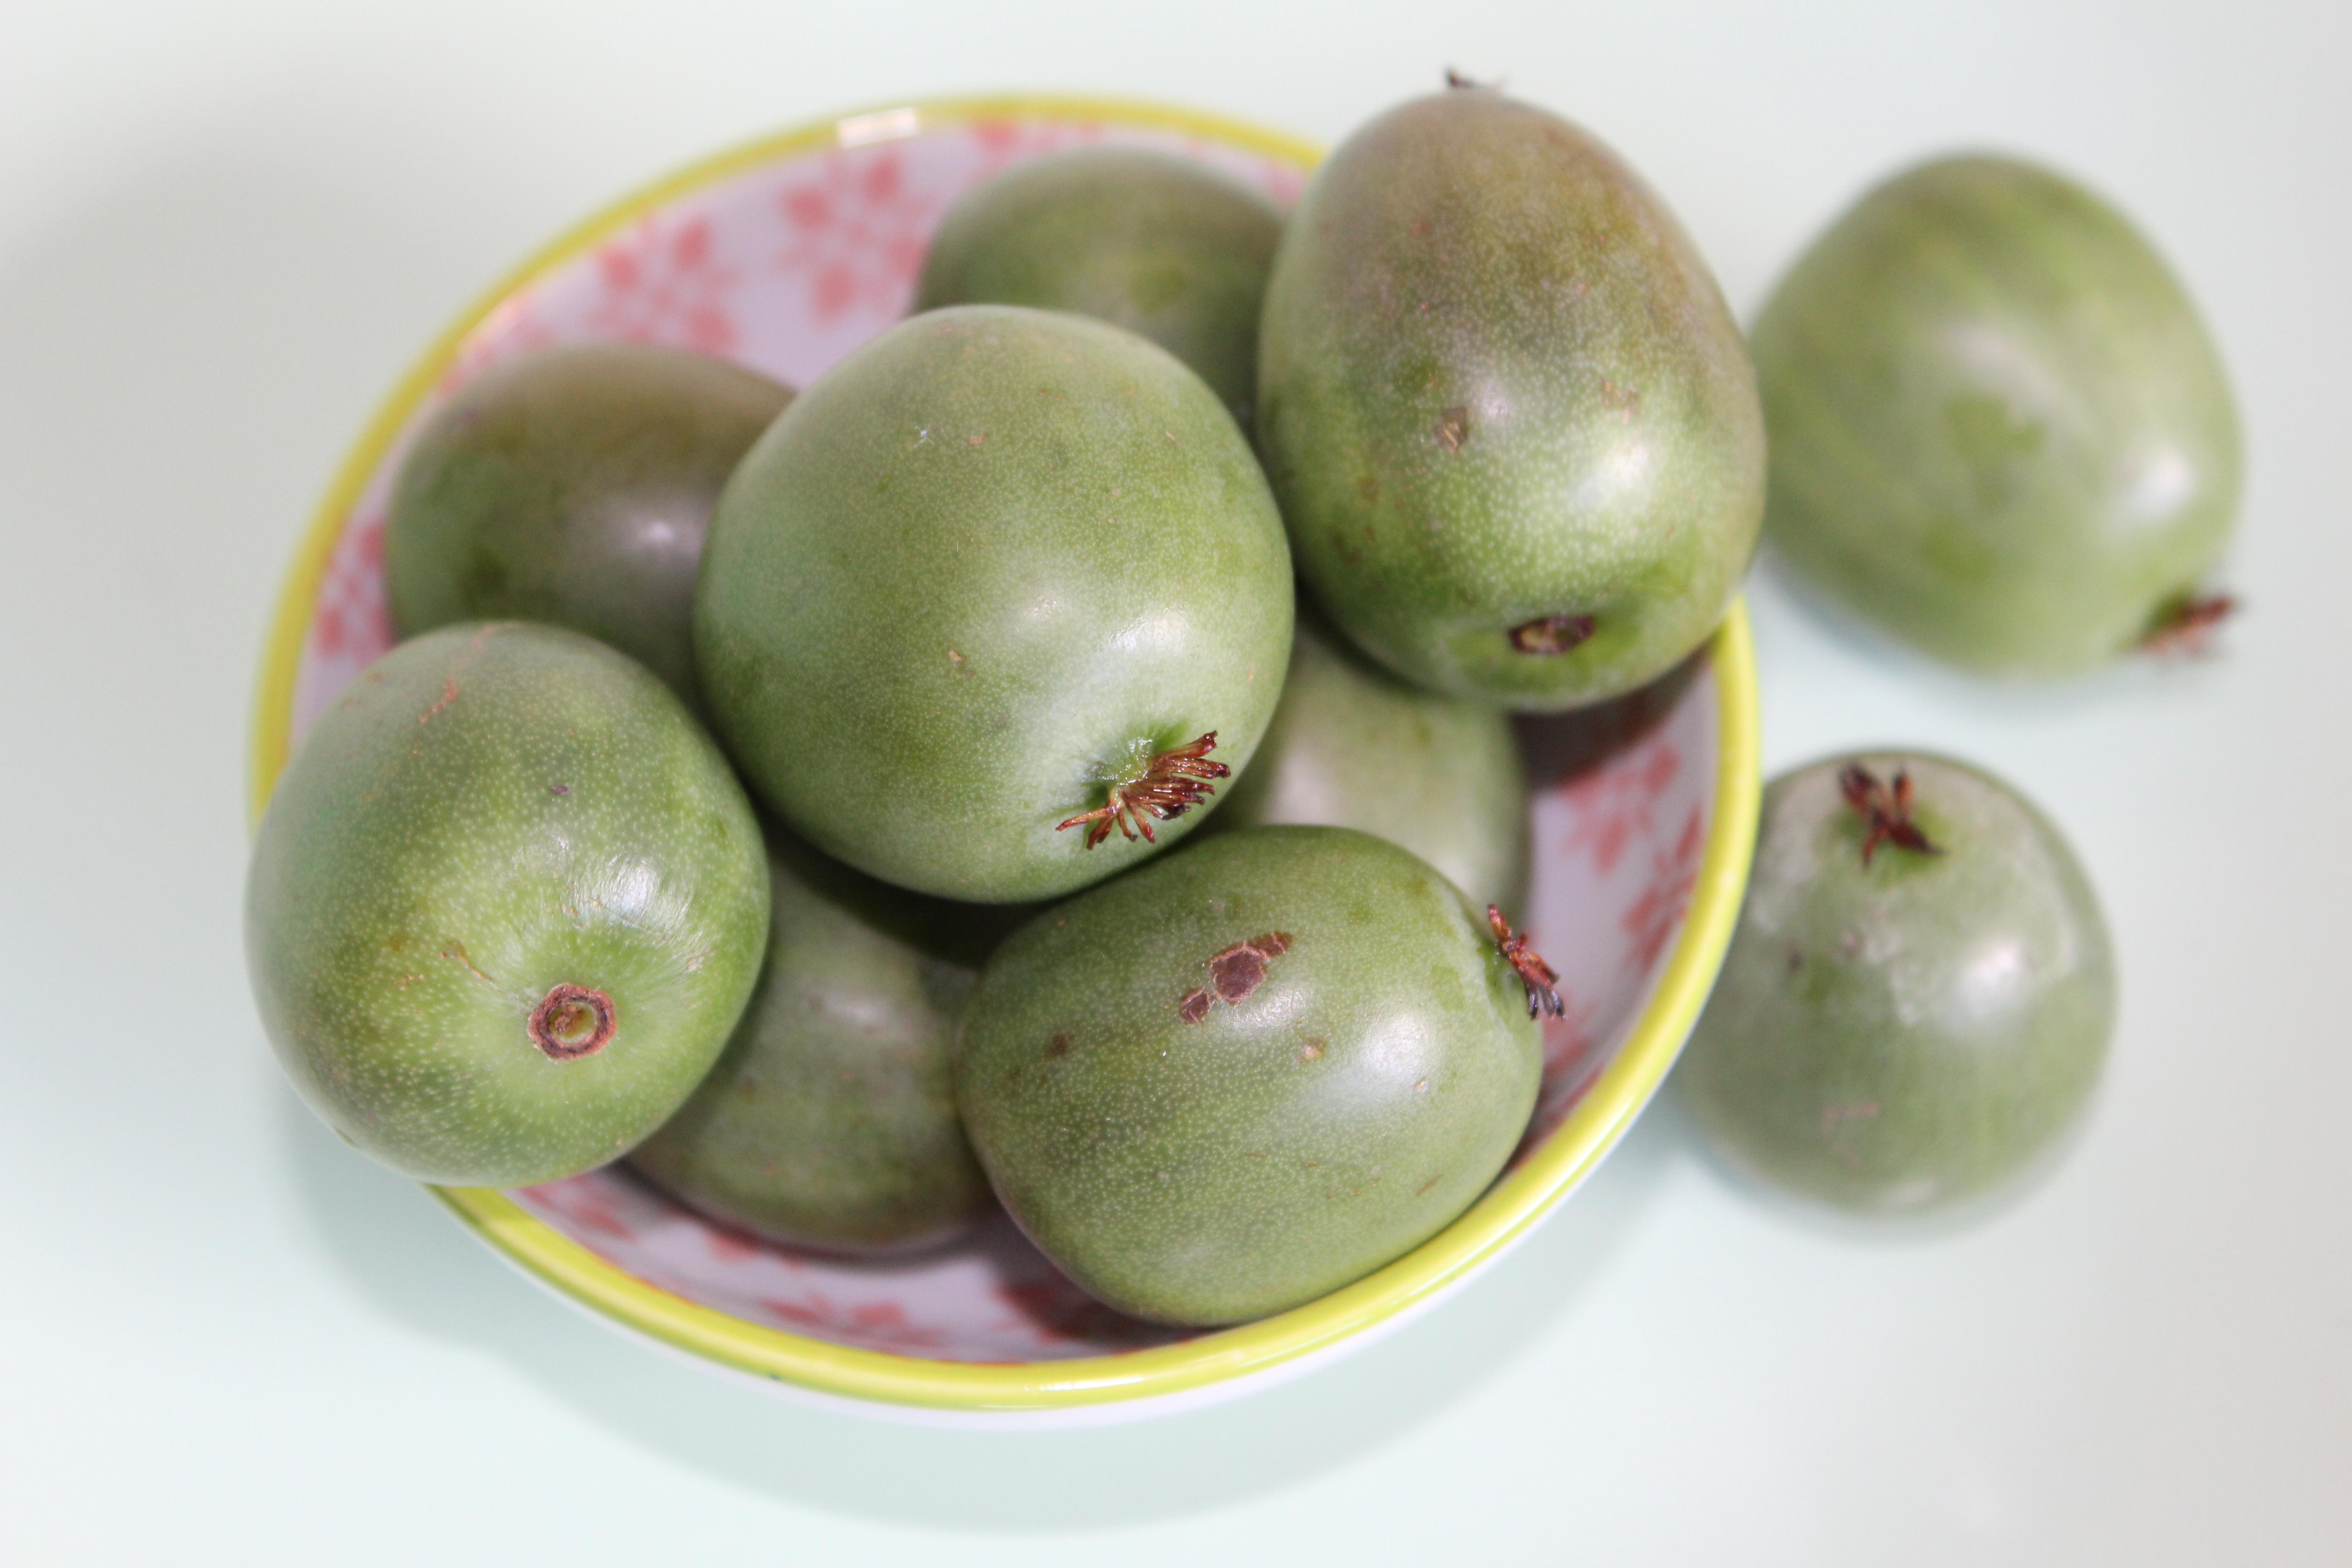 NERGI de kleine kiwibes- GoodGirlsCompany-baby kiwi-Hoe smaakt Nergi